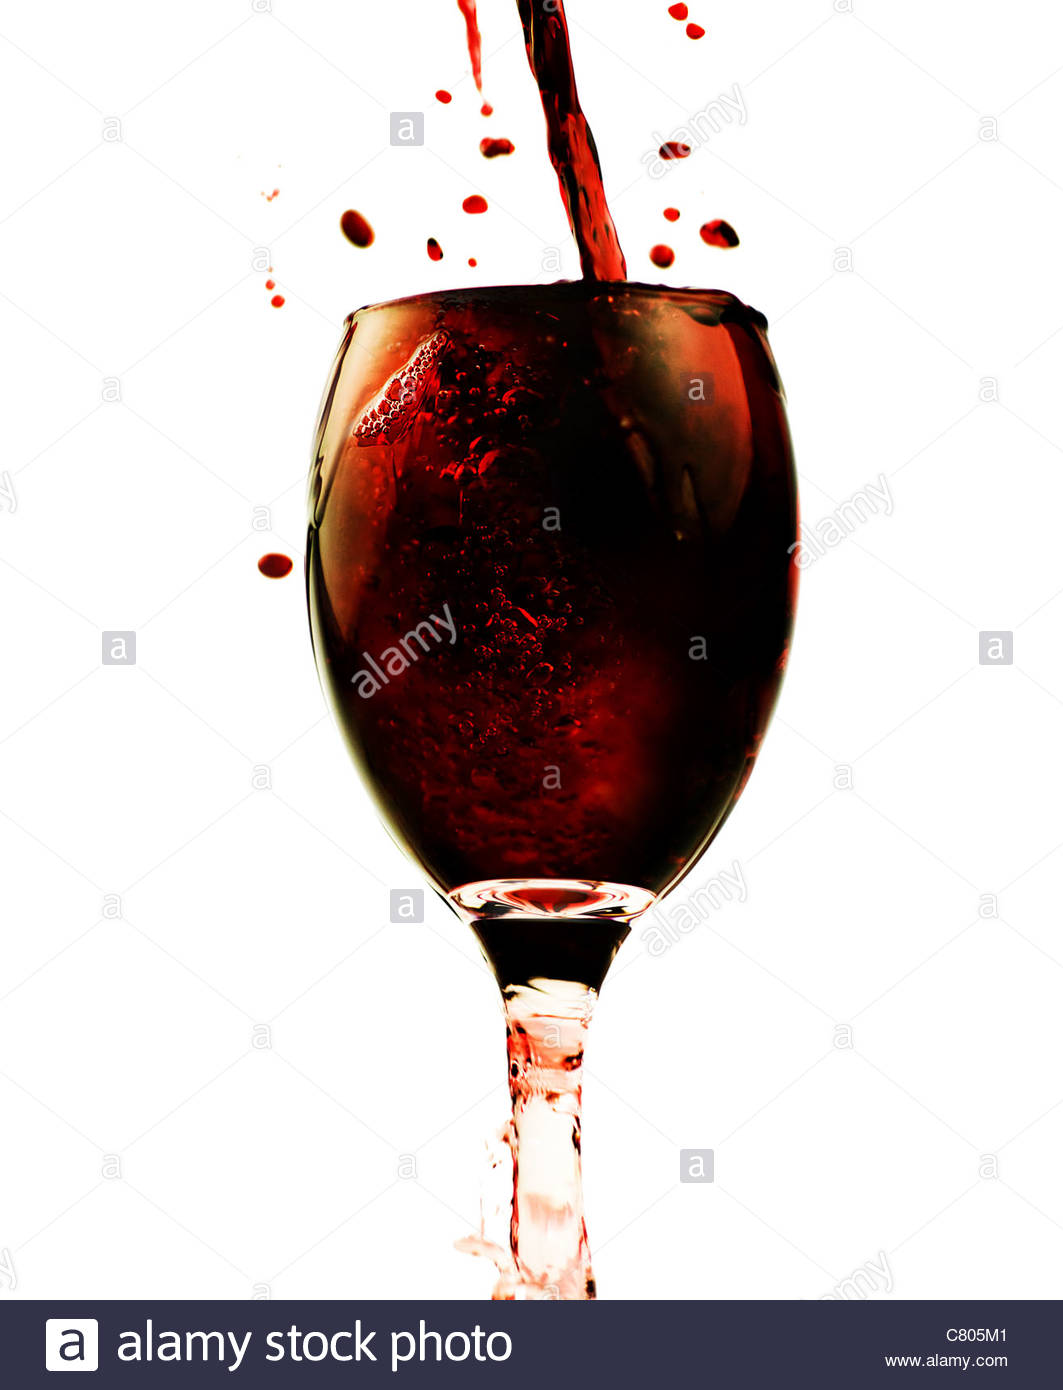 red wine splash - Stock Image